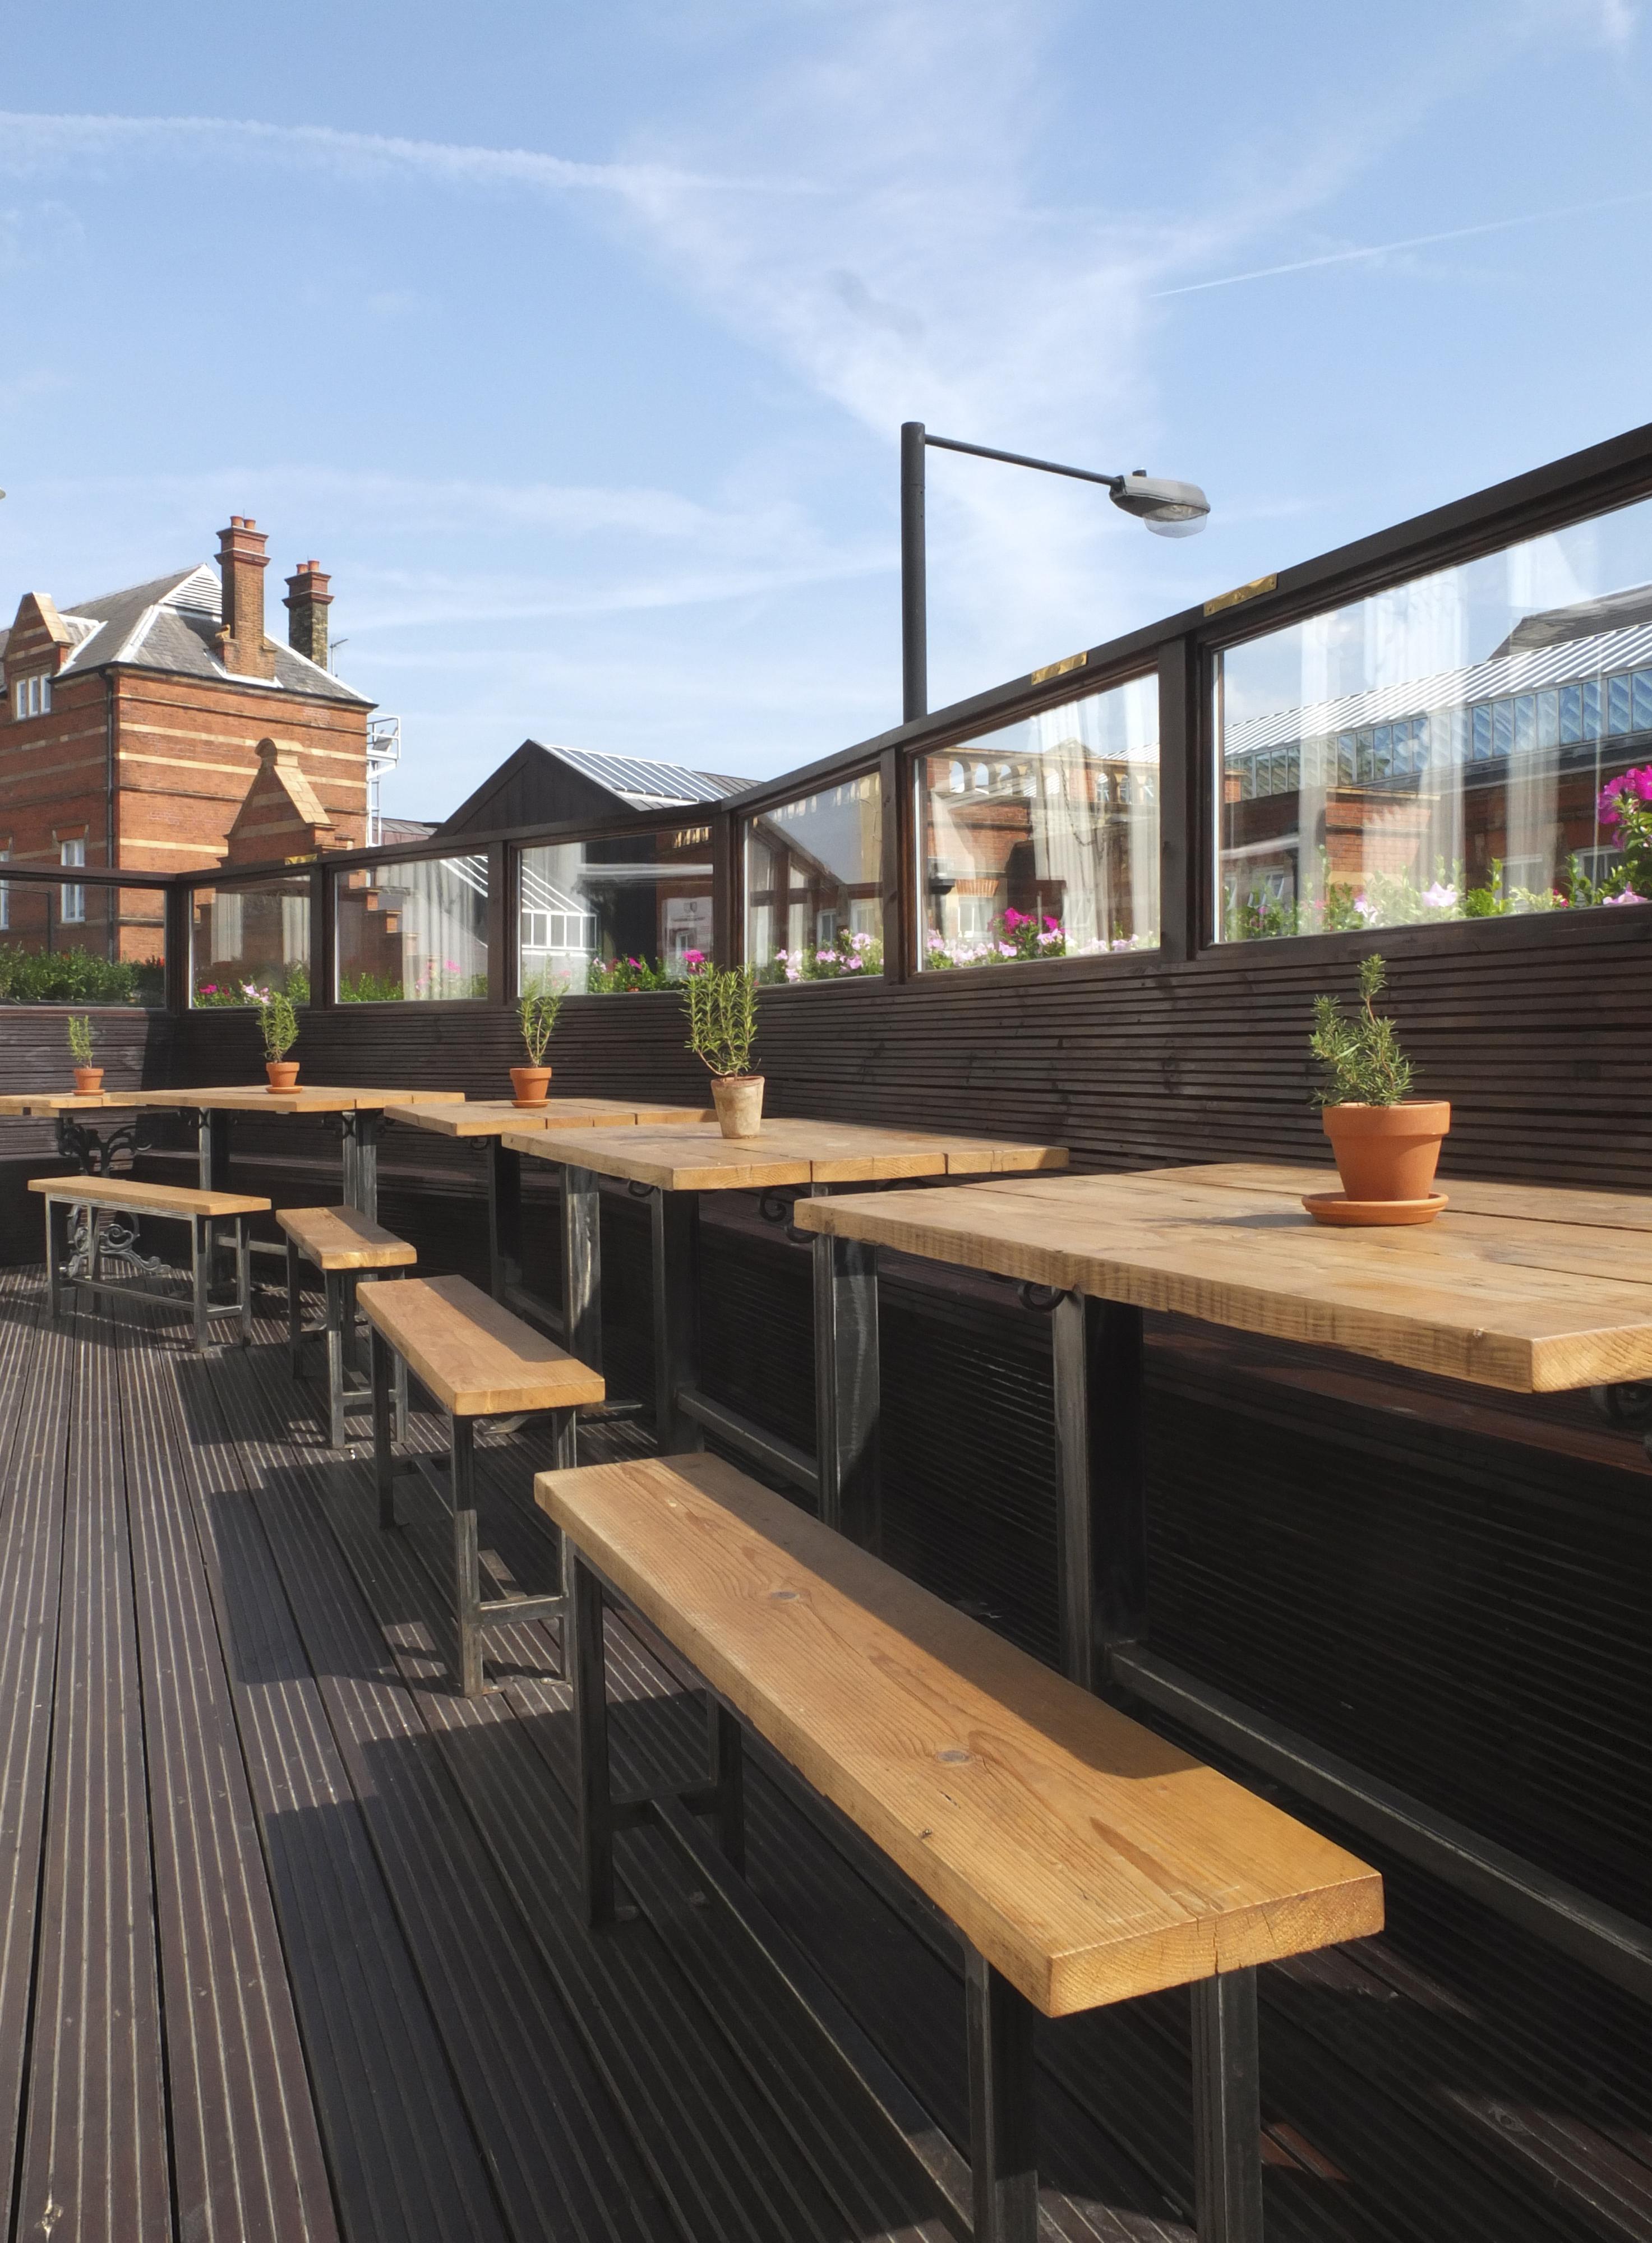 London pub roof garden relic interiors london for 18 leinster terrace london w2 3et